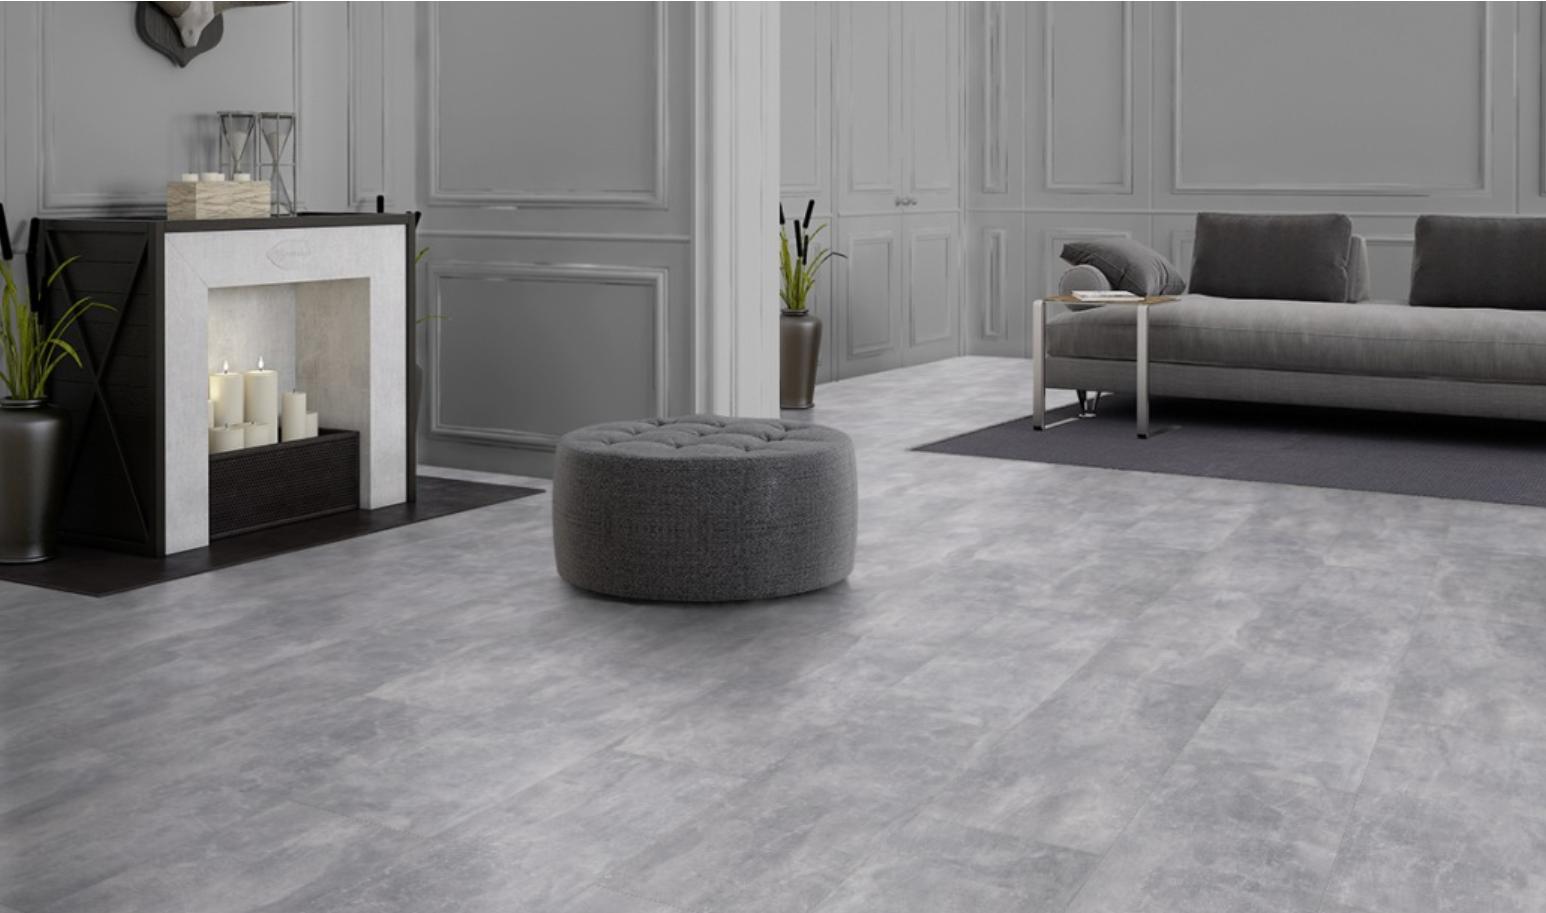 Betoon Look Vloer : Visio grande grijs beton look tegel laminaat directfloor